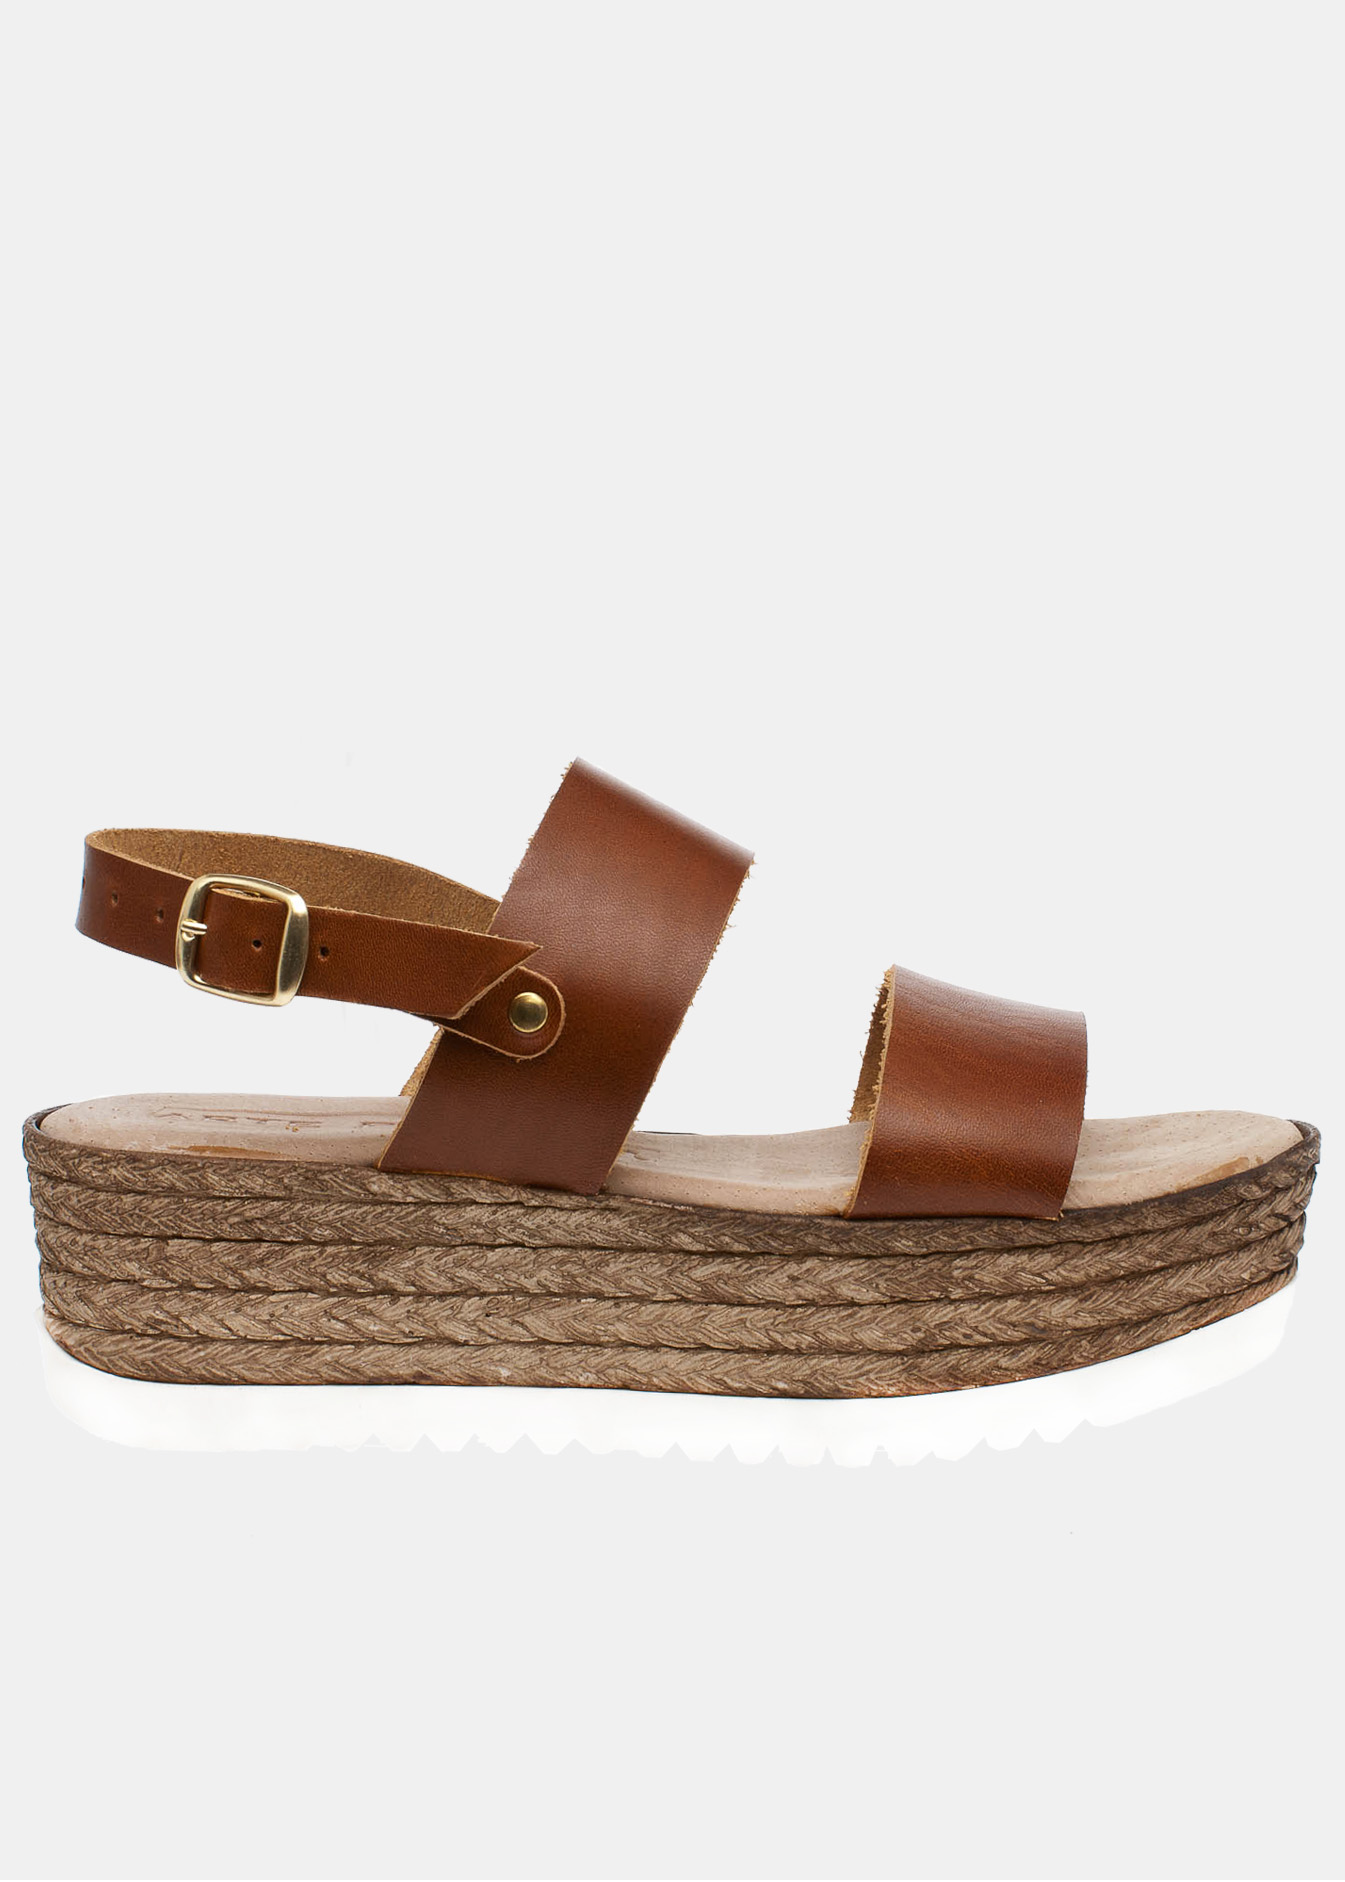 Blair δερμάτινη flatform, καφέ παπούτσια